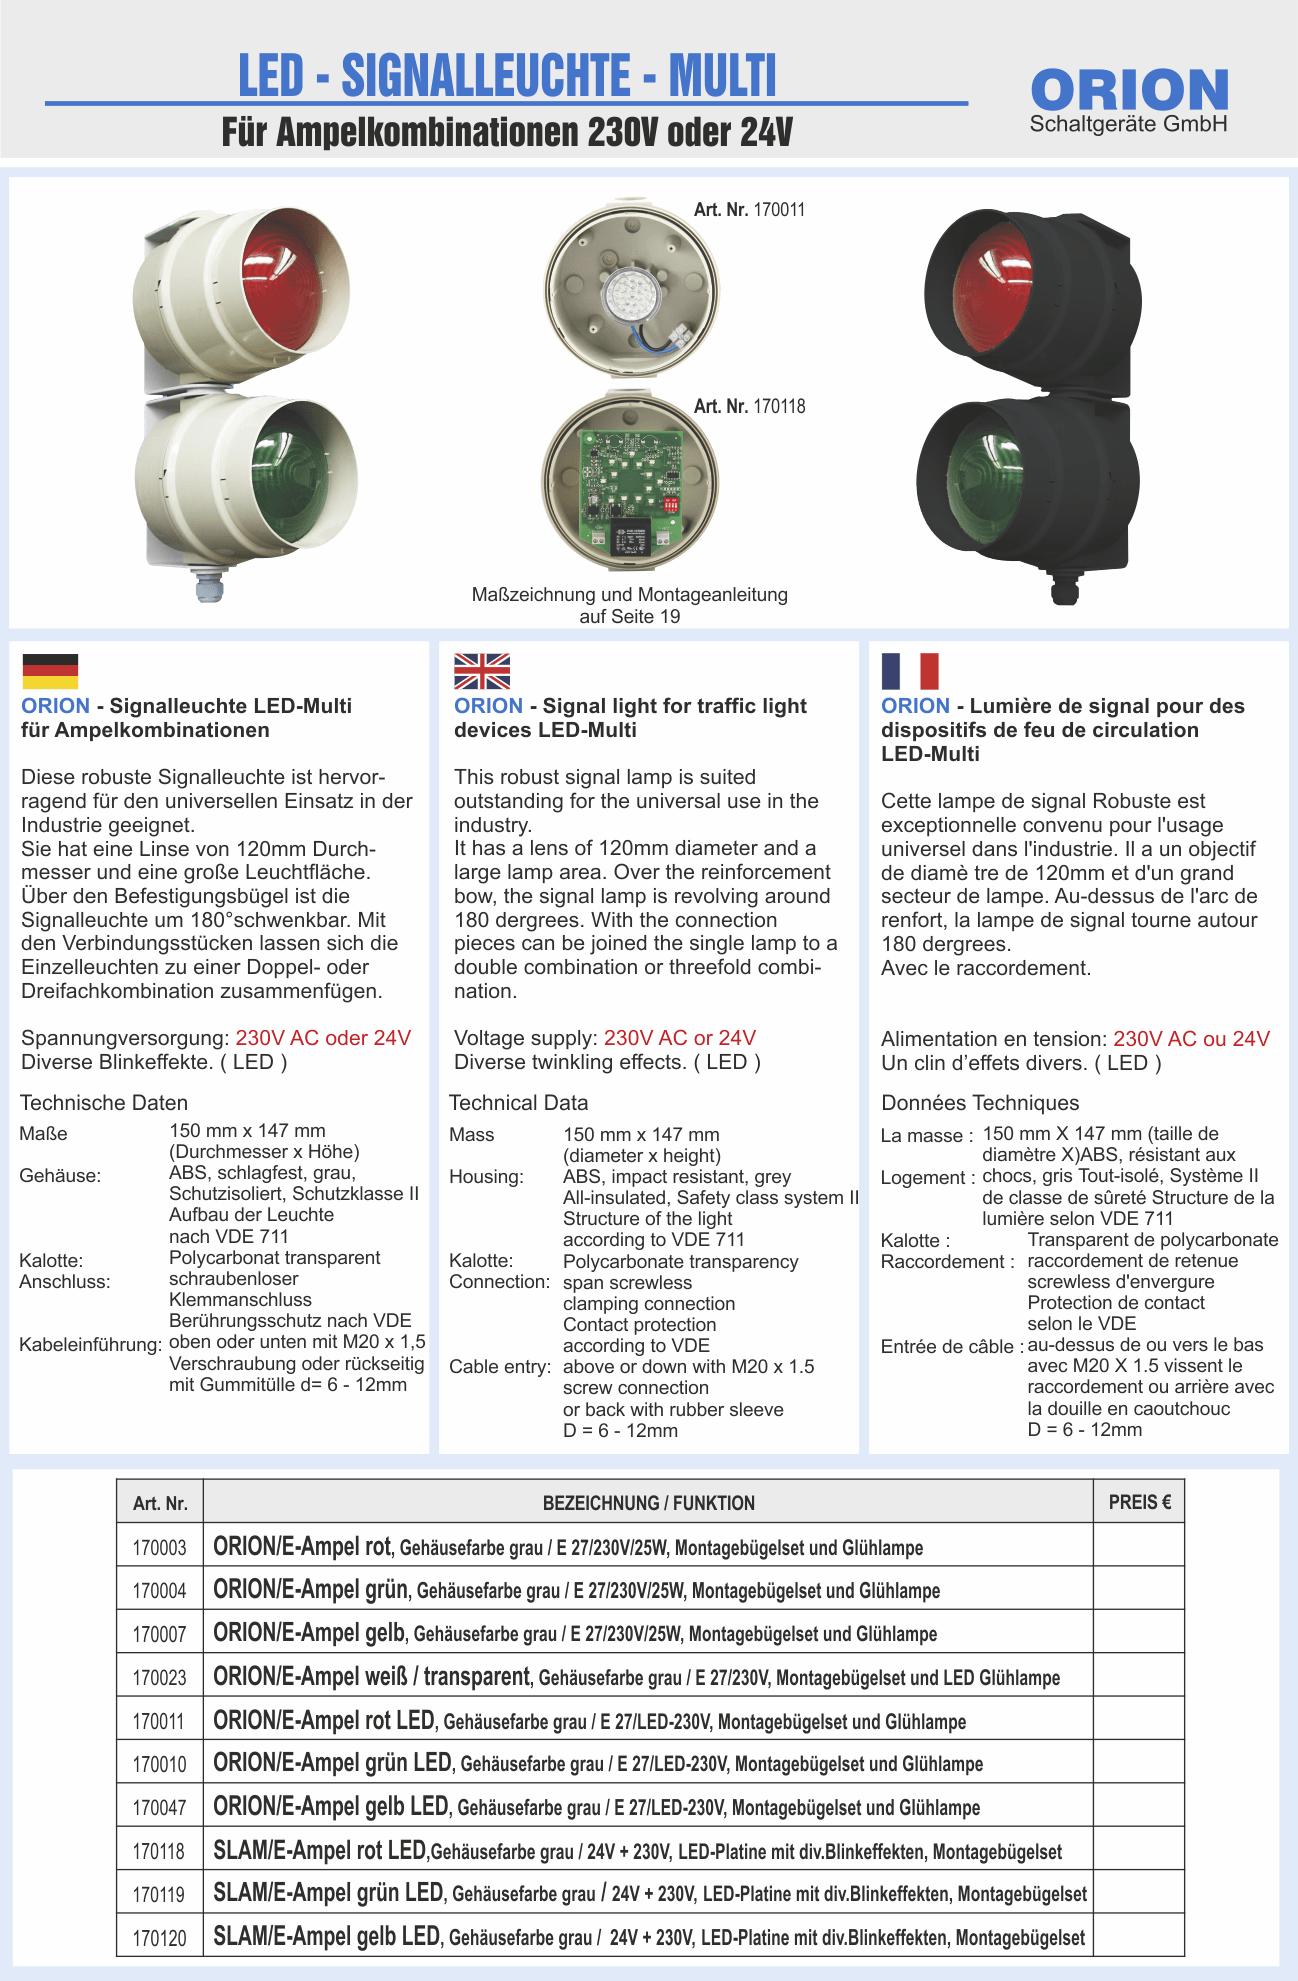 Signalleuchte LED-Multi